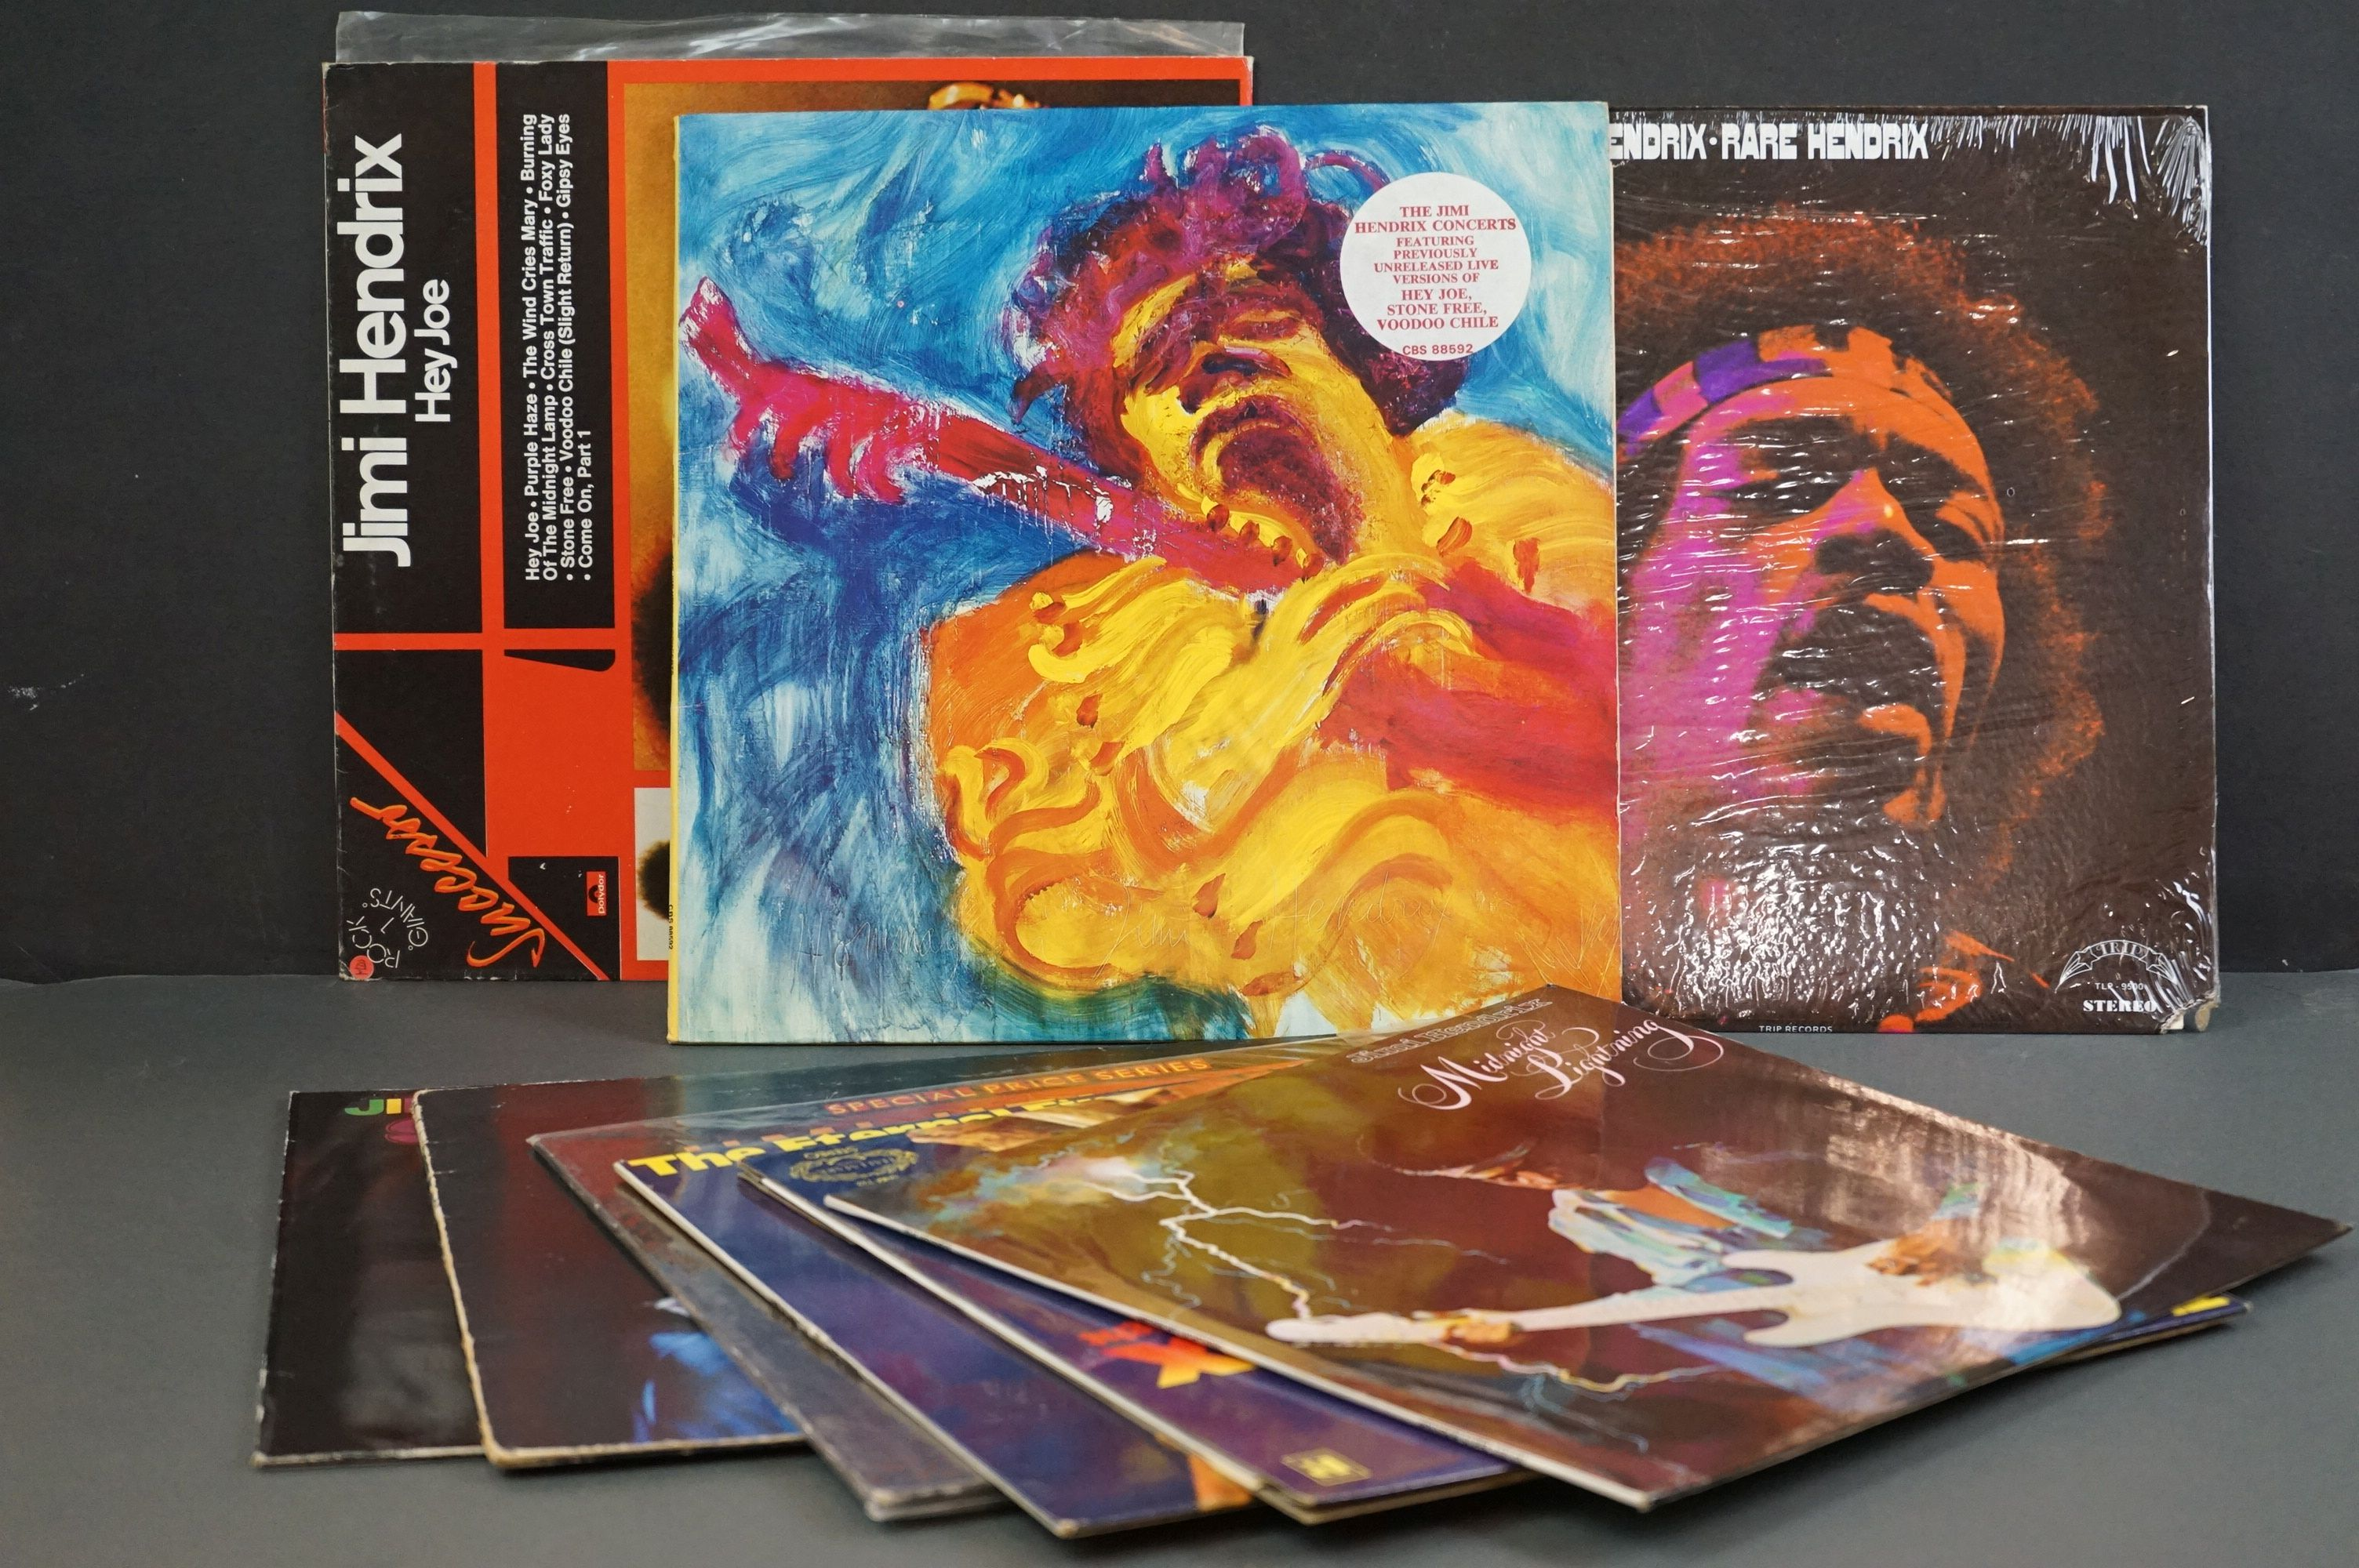 Vinyl - Nine Jimi Hendrix LPs to include Smash Hits, Hey Joe (Italian pressing), Stone Free, Jimi